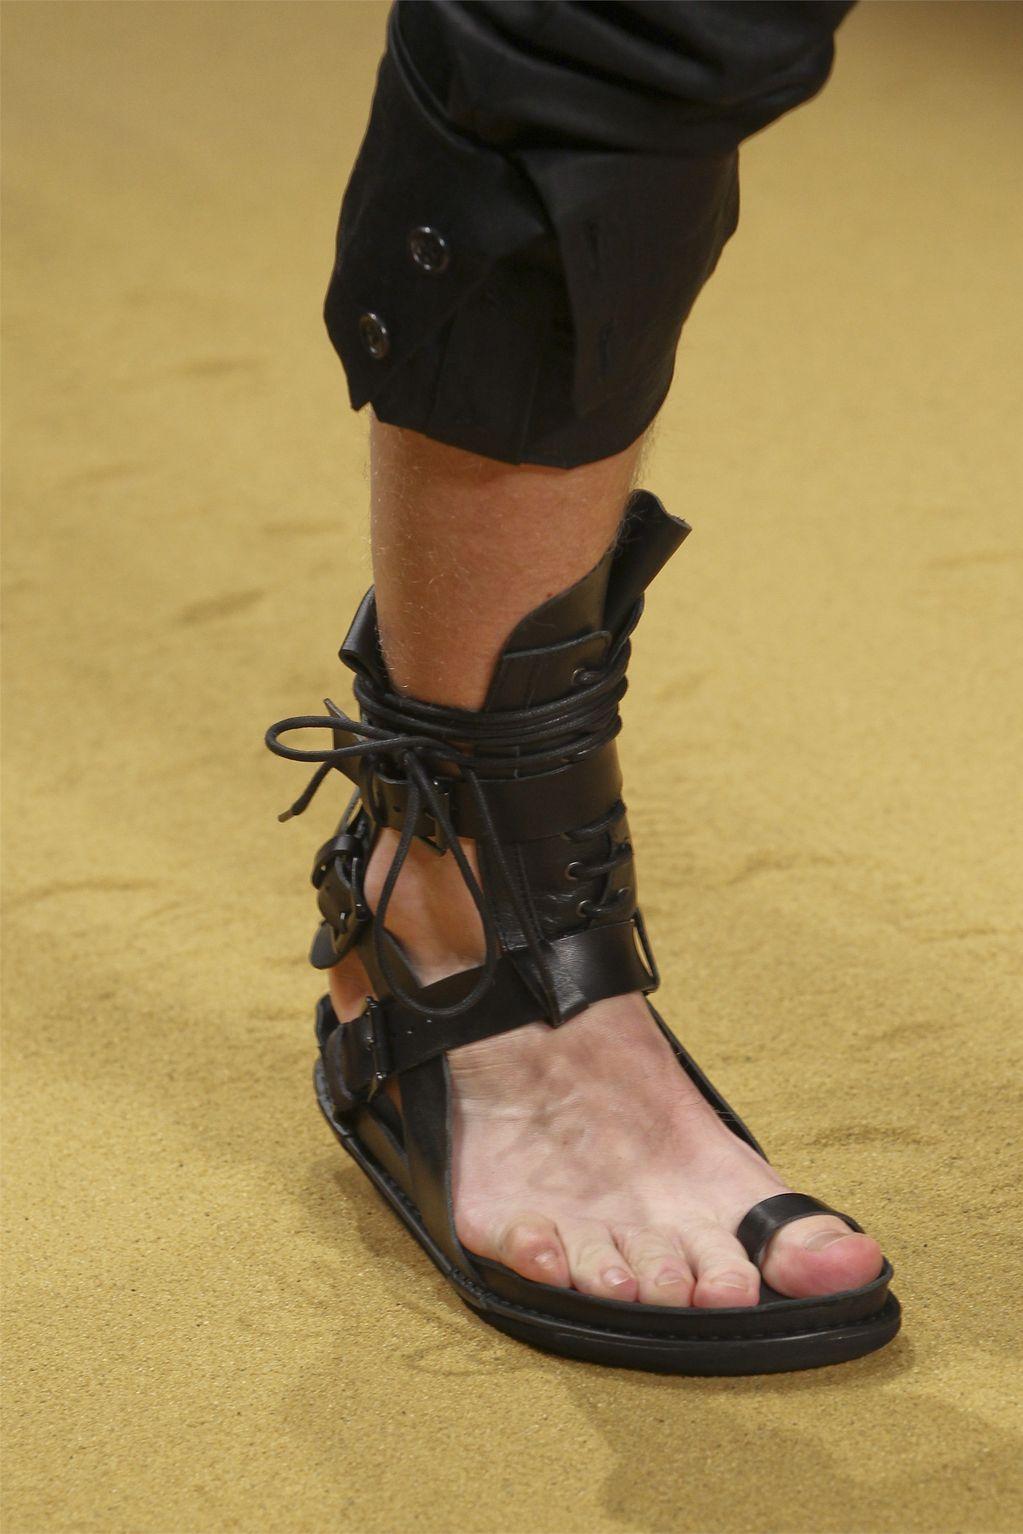 ba4c9f1d7232 Items similar to Leather Gladiator Sandals for Men handmade on Etsy